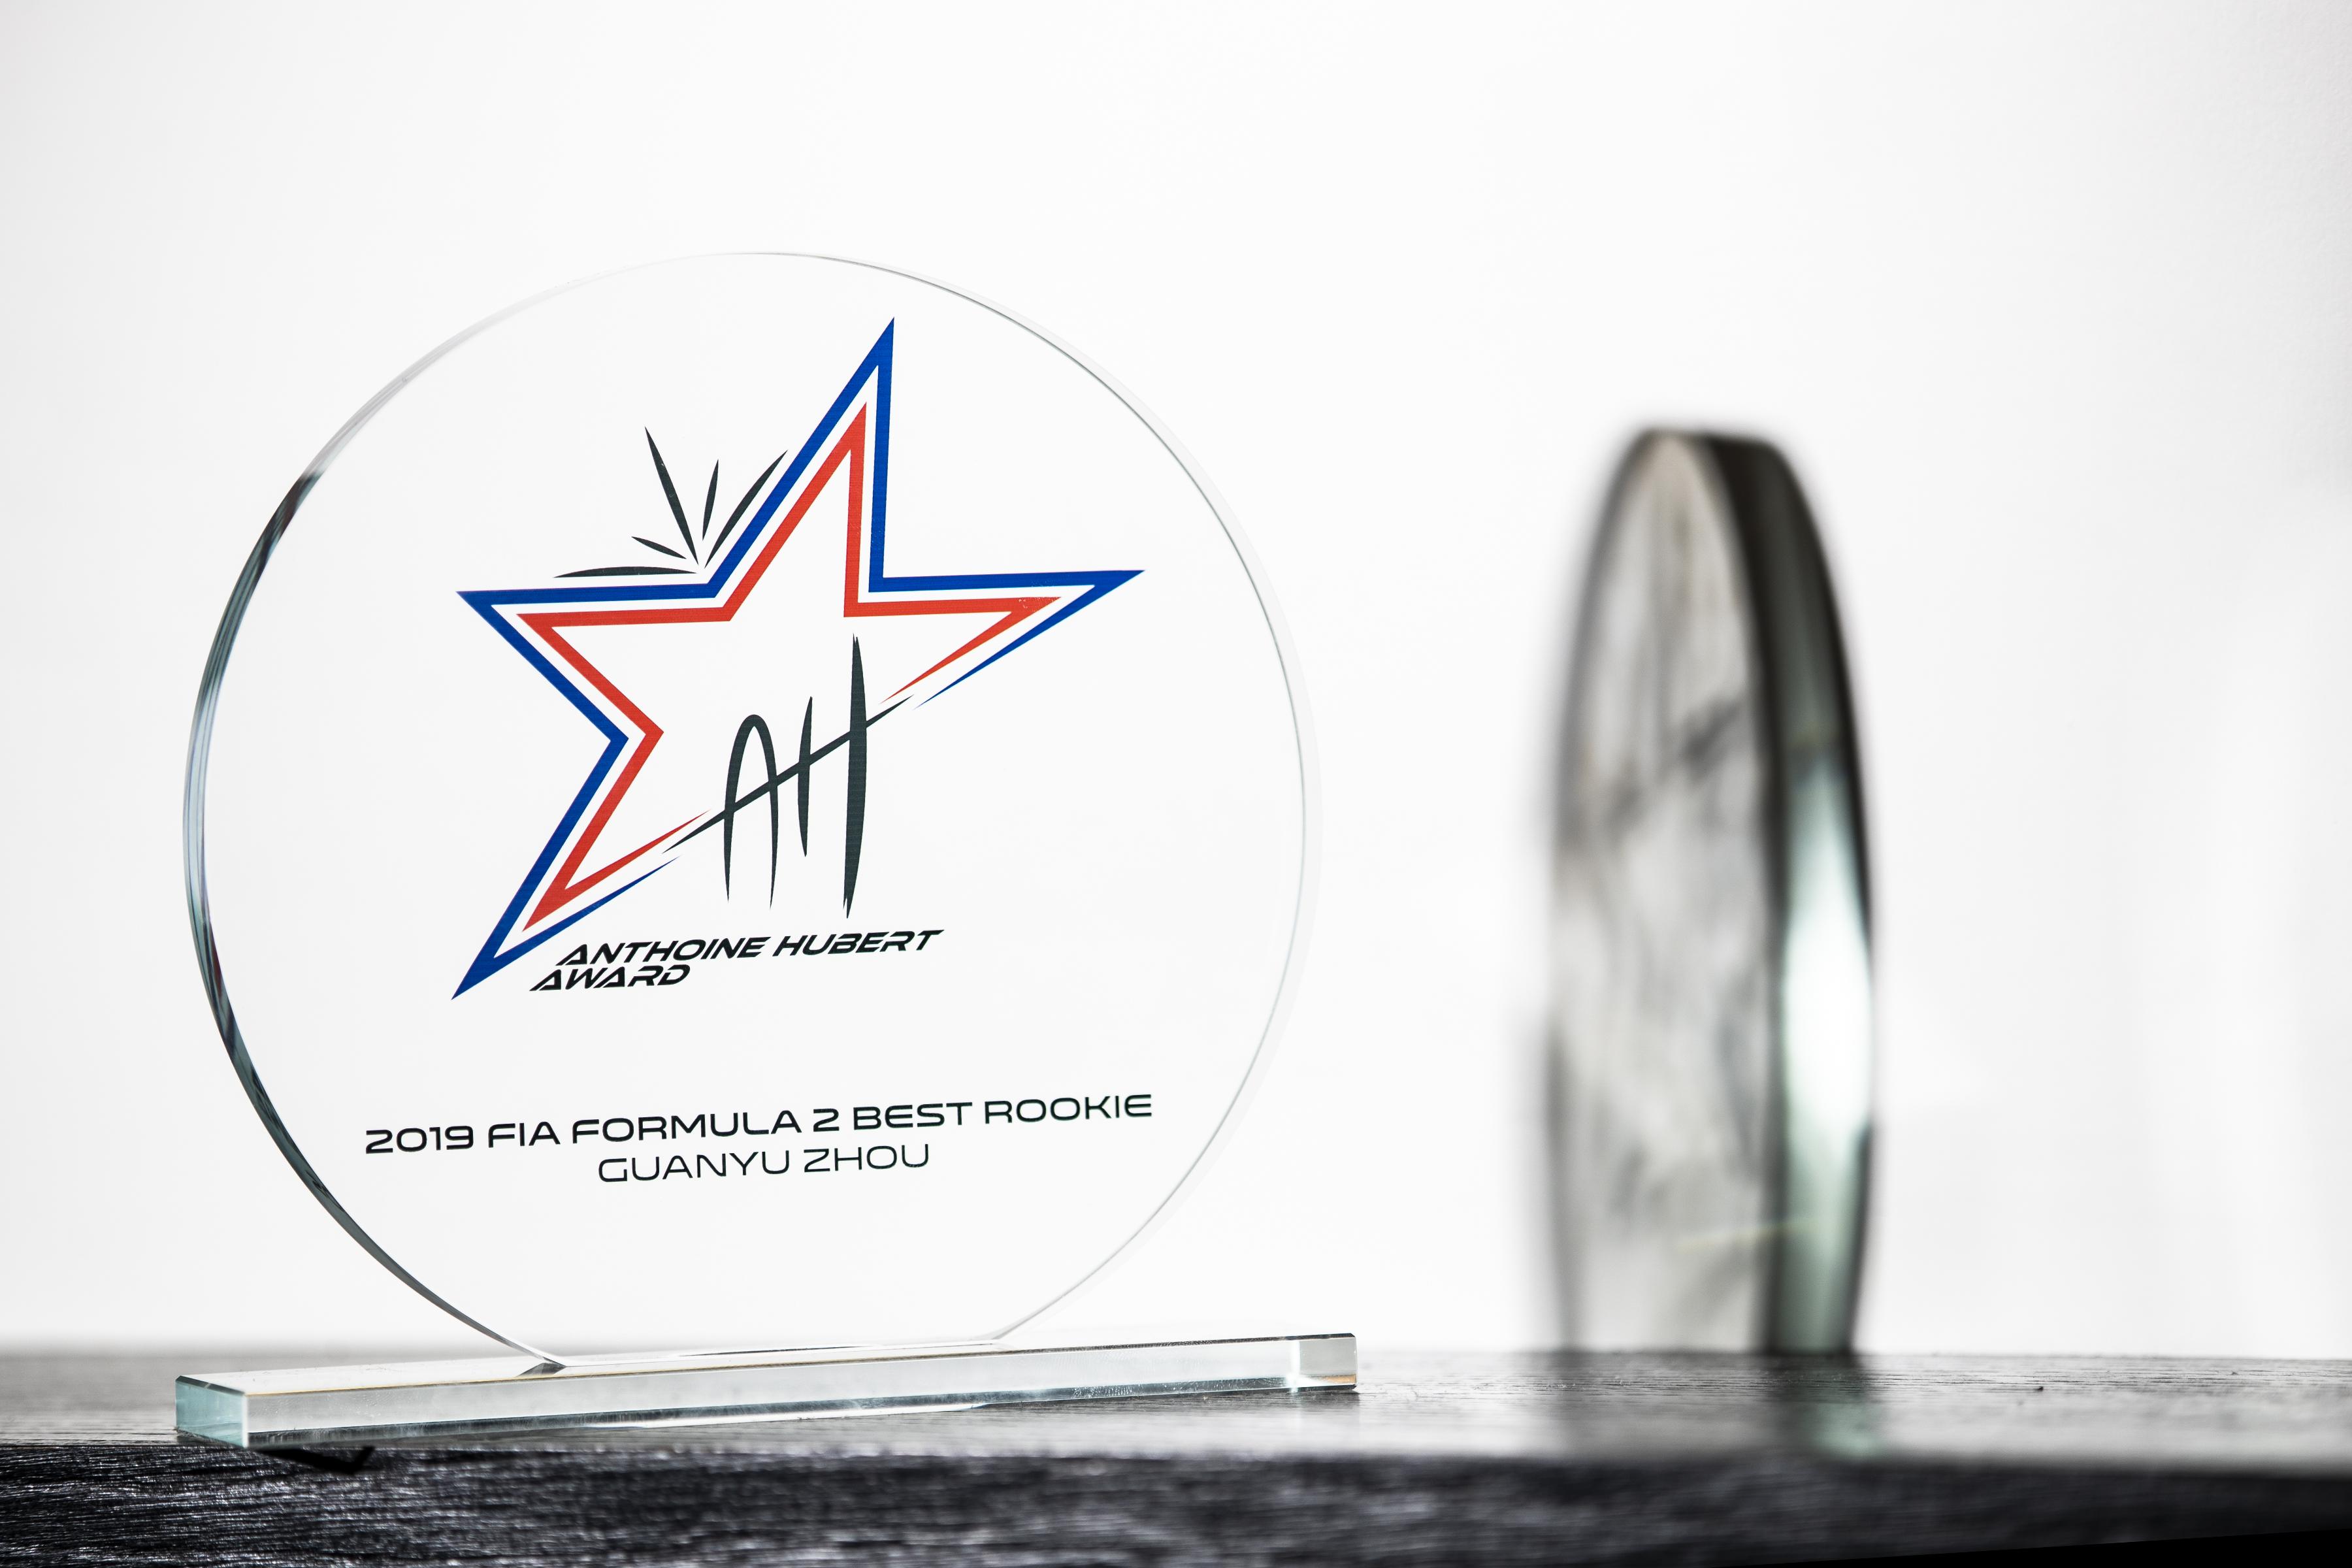 F1 Formula 1 Formula 2 Anthoine Hubert Award Guanyu Zhou Bruno Michel